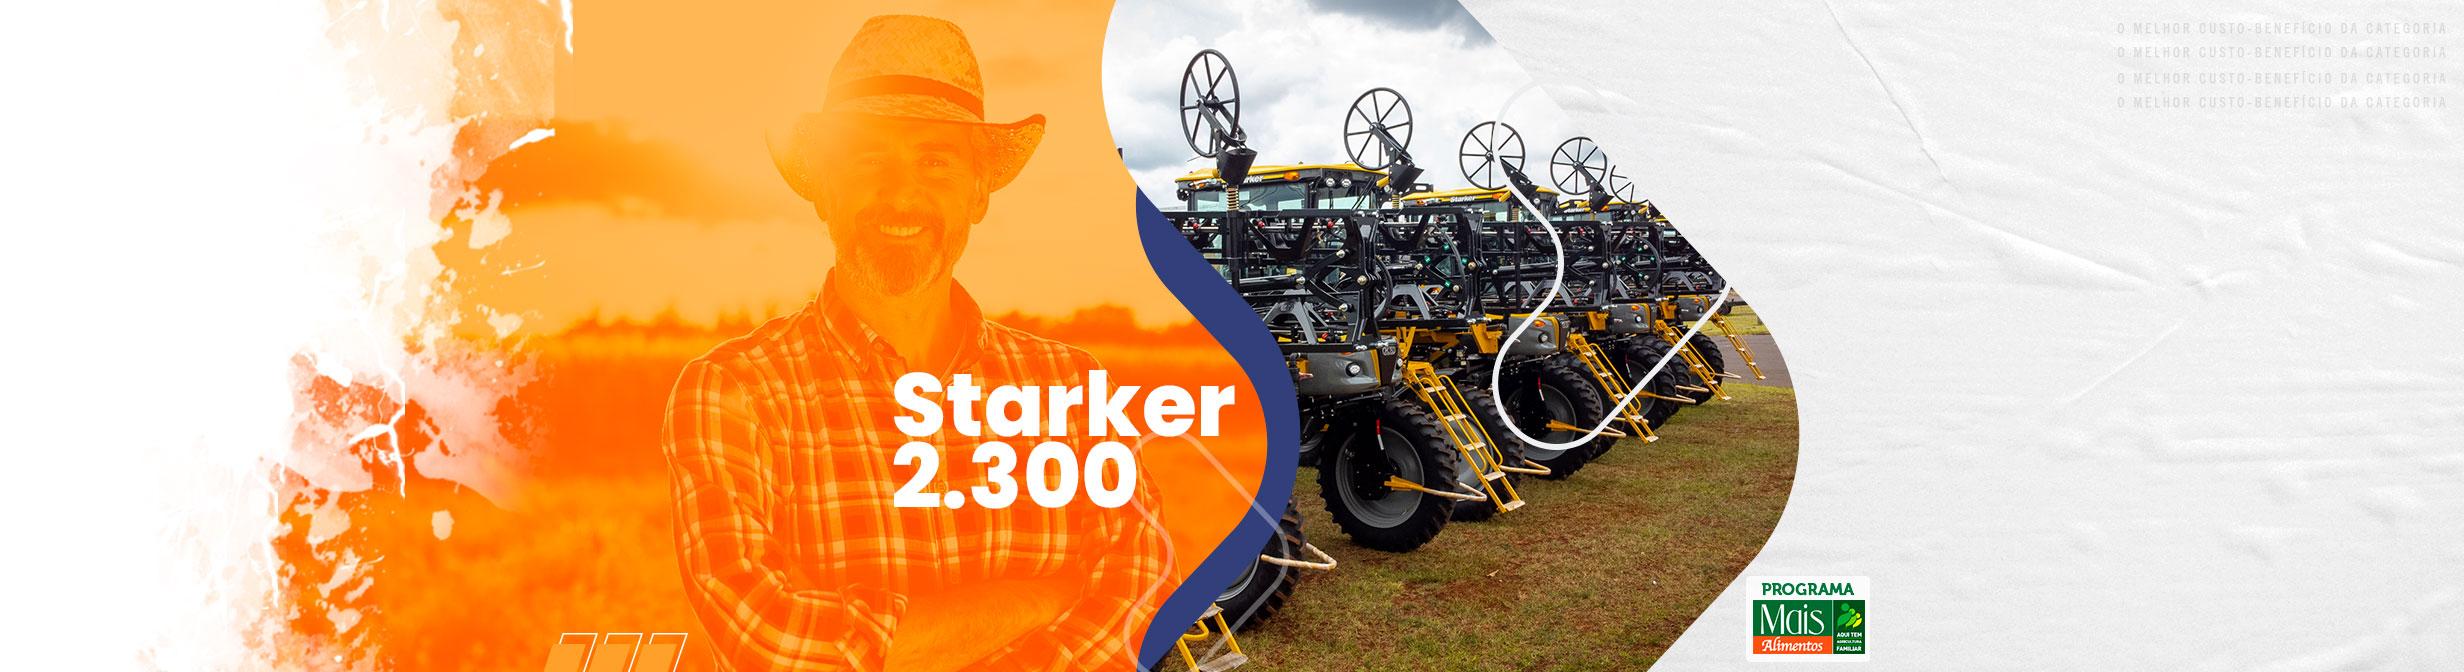 novostarker2300